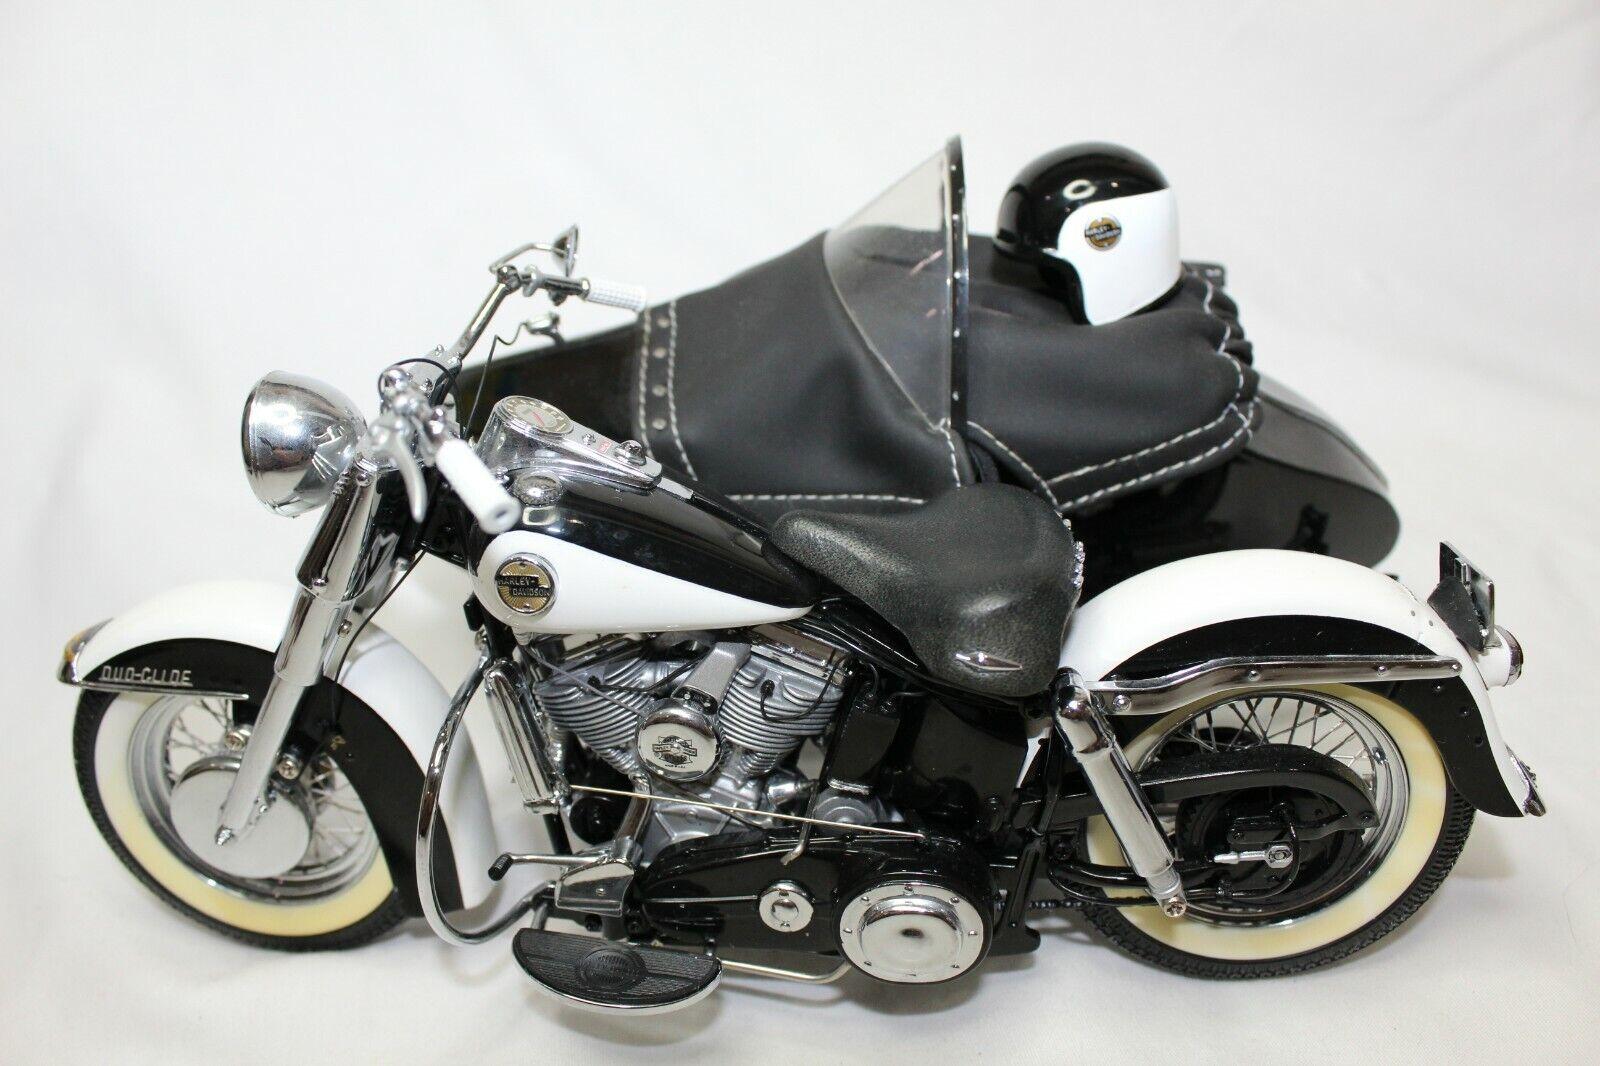 buscando agente de ventas Franklin Mint 1 10 escala escala escala 1958 Harley-Davidson Duo-Glide Con SideCoche-flojo  precio mas barato